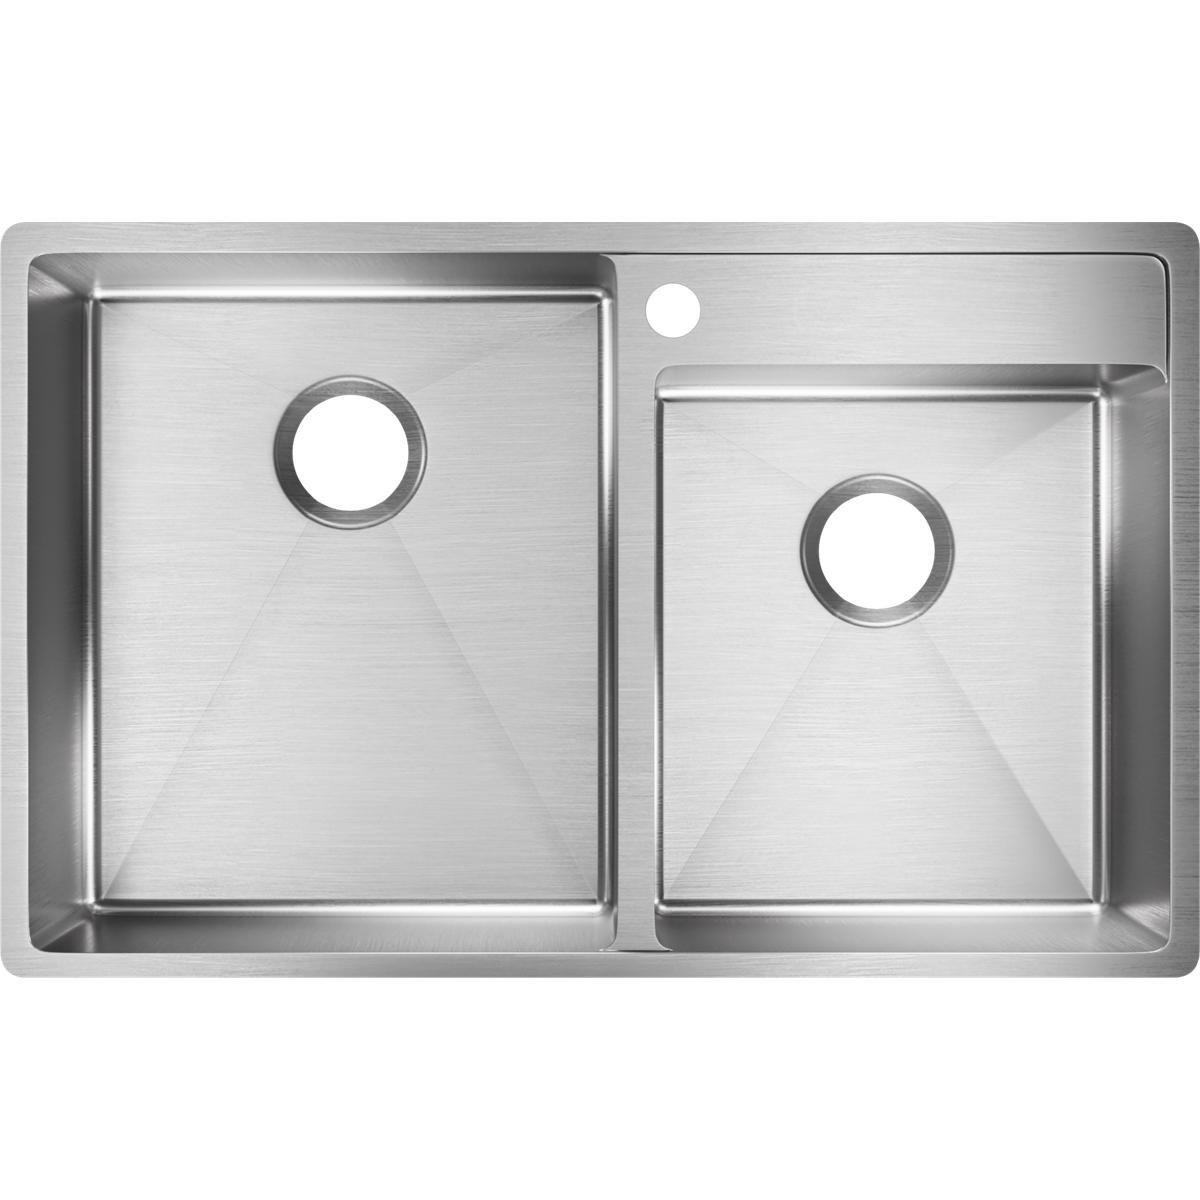 Elkay Crosstown ECTRUD31199R1 Offset Double Bowl Undermount Stainless Steel Kitchen Sink with Water Deck